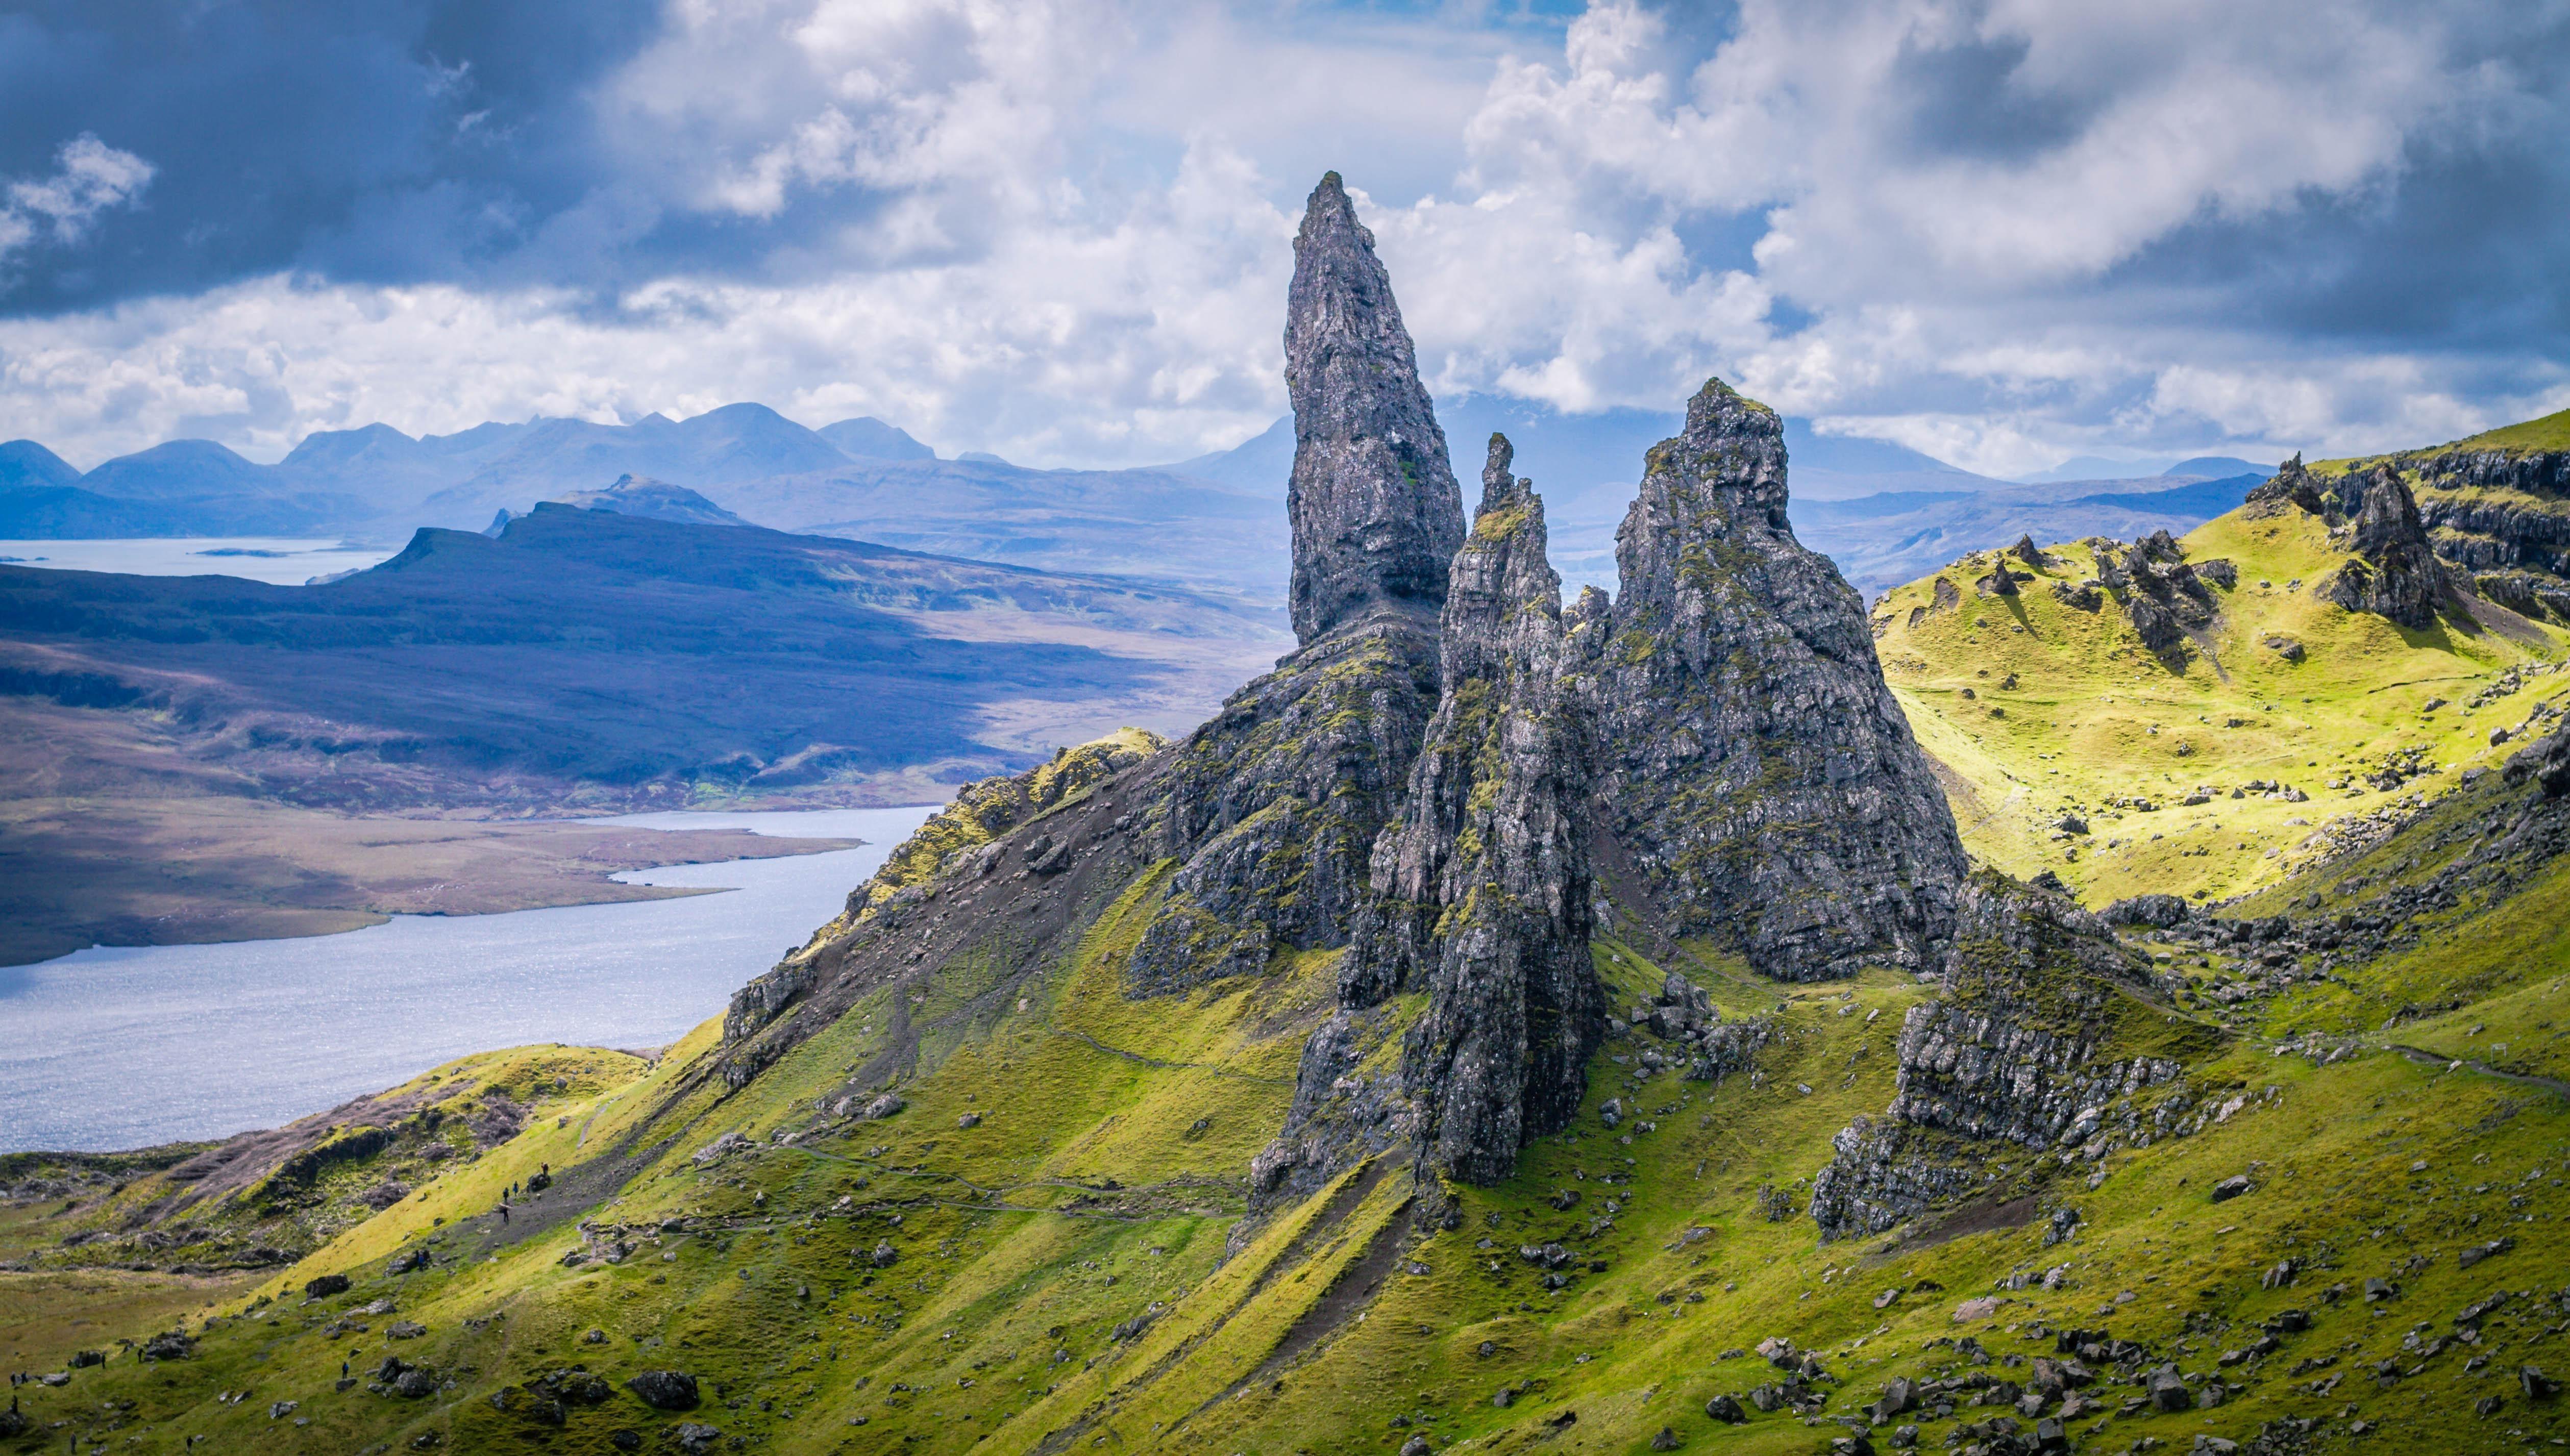 Old Man Of Storr Isle Of Skye Scotland Hd Wallpaper From